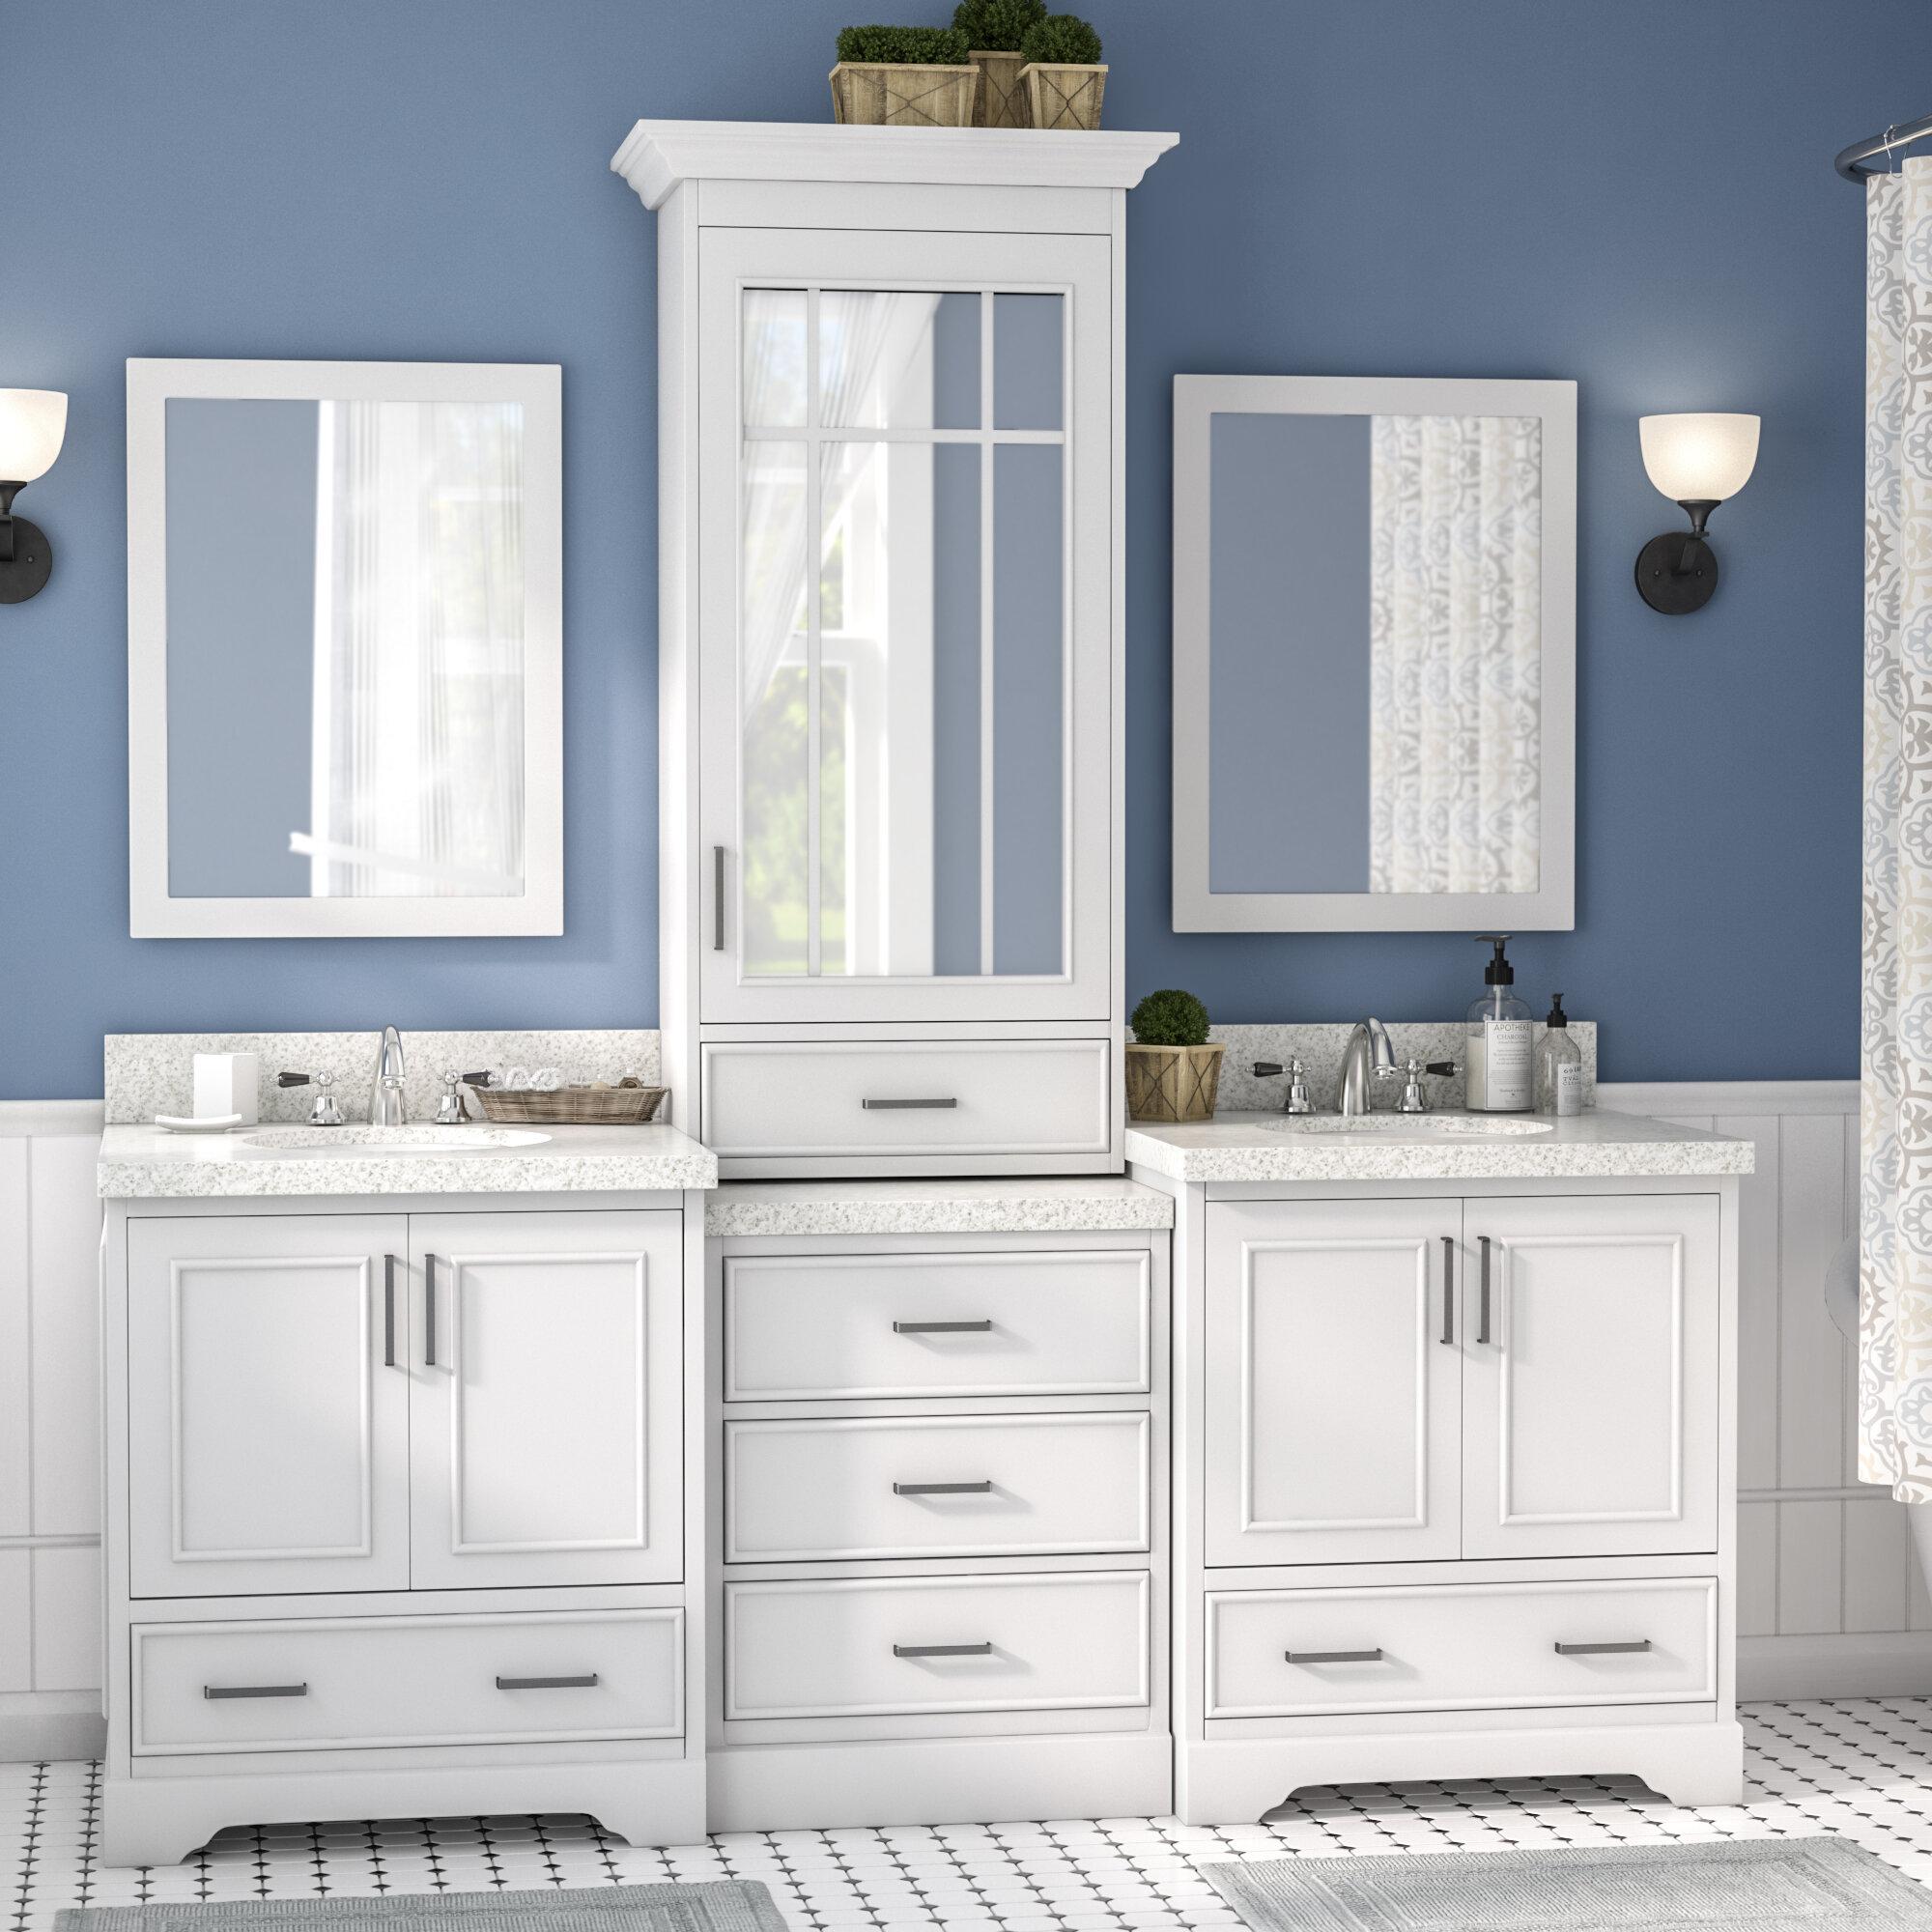 Darby Home Co Geraldina 85 Double Sink Bathroom Vanity With Mirror Wayfair